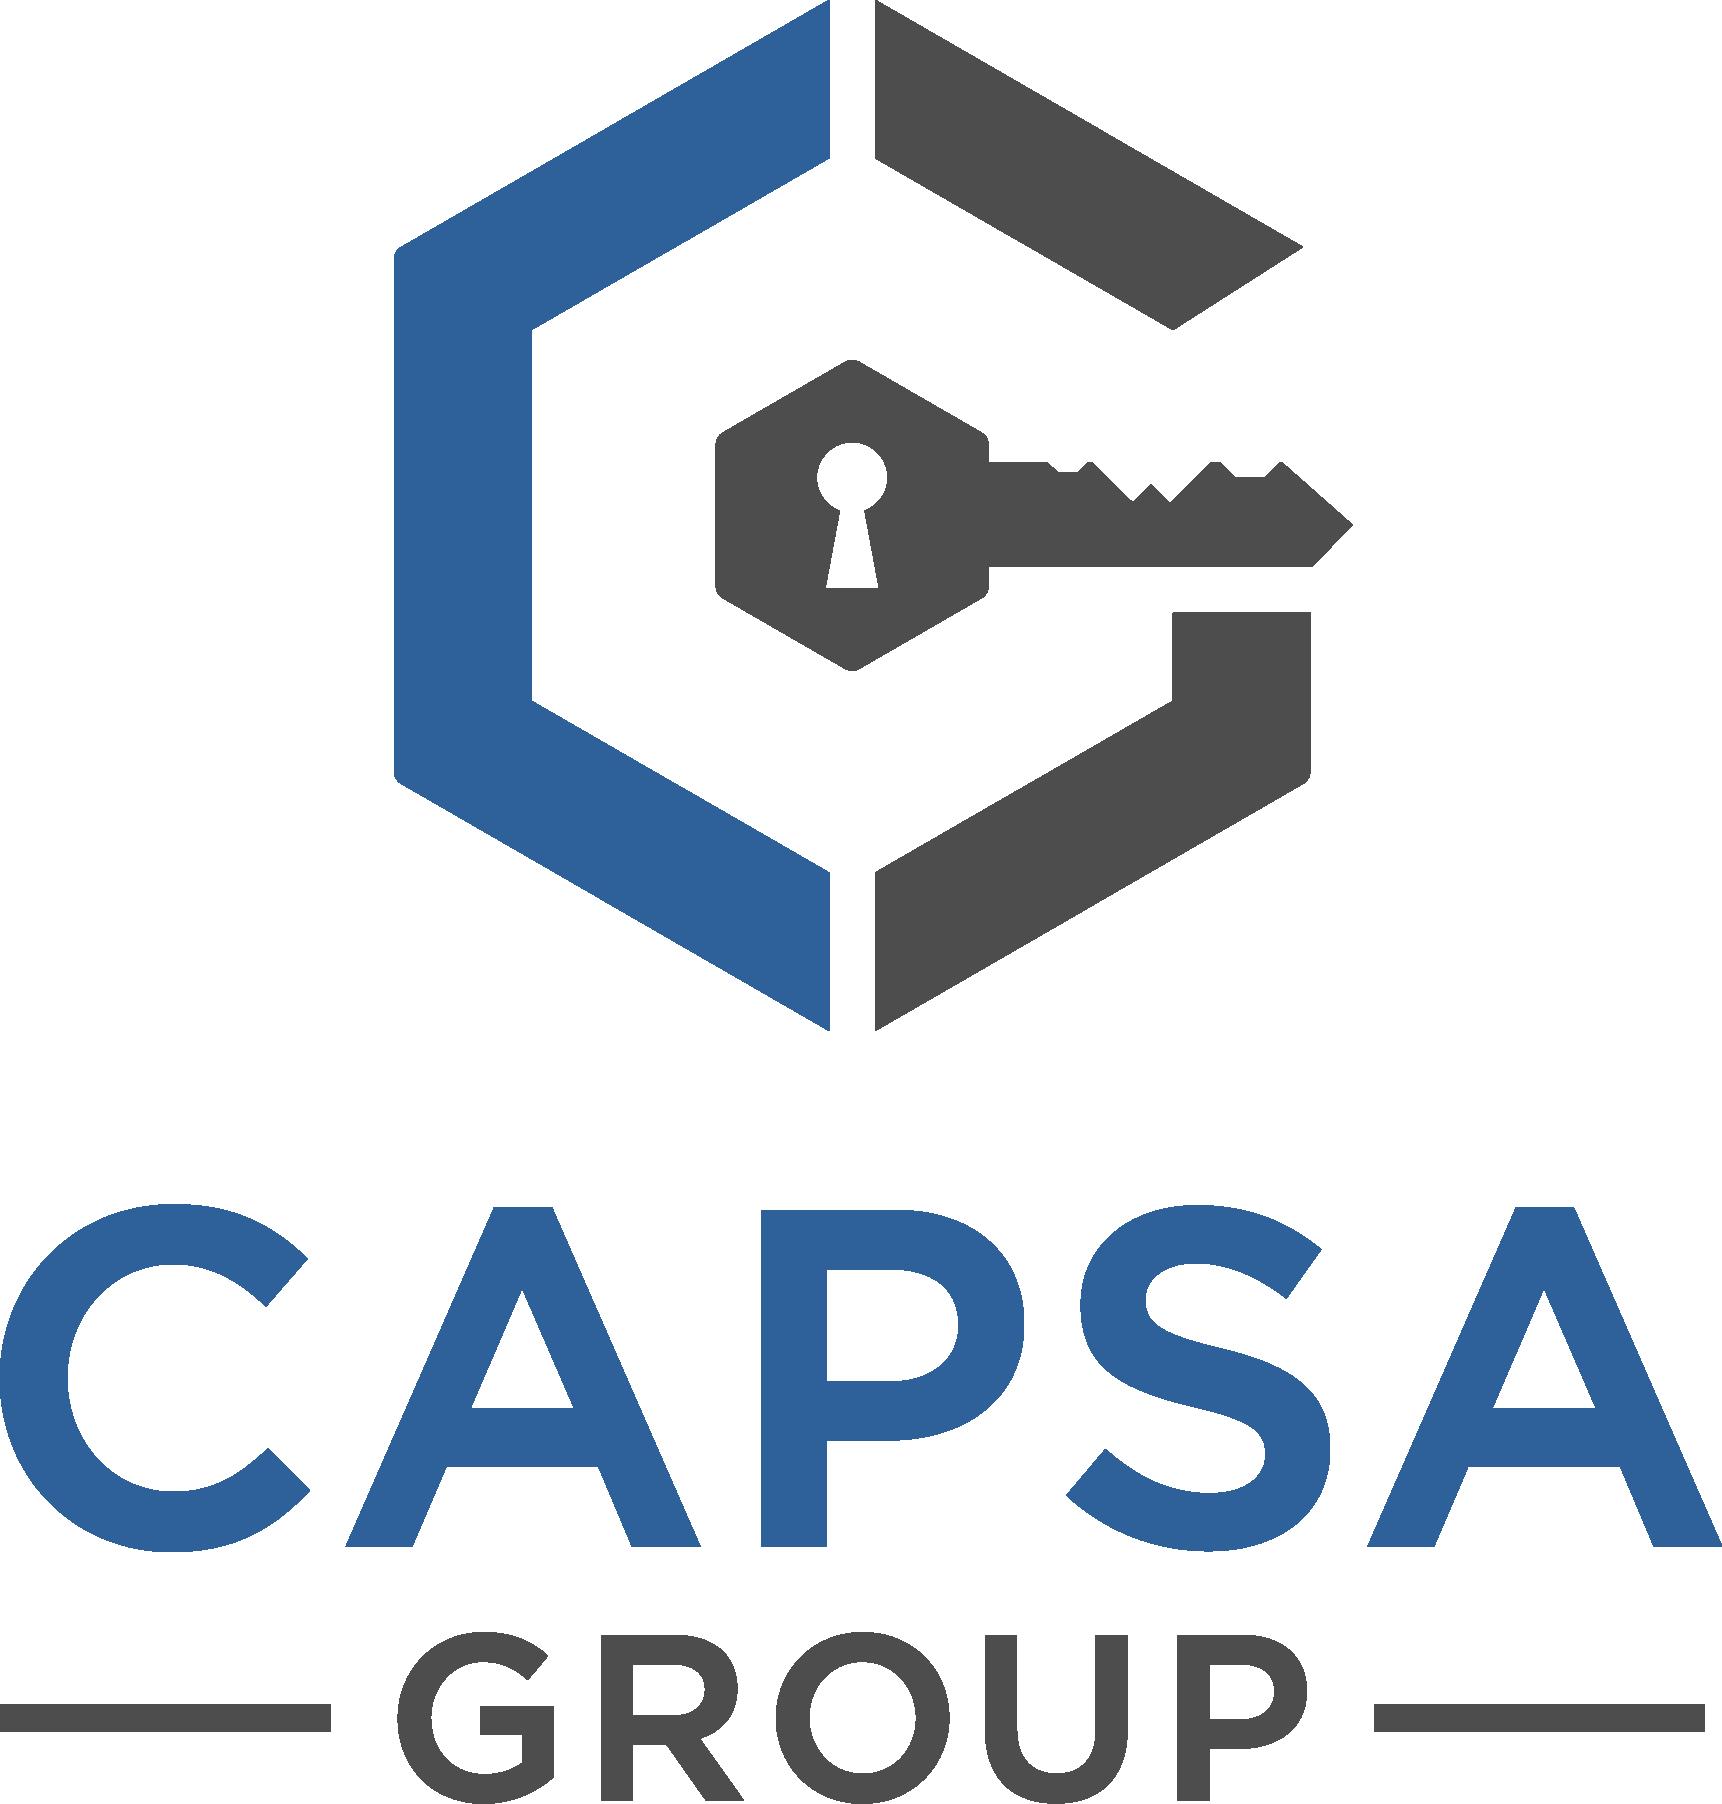 The Capsa Group